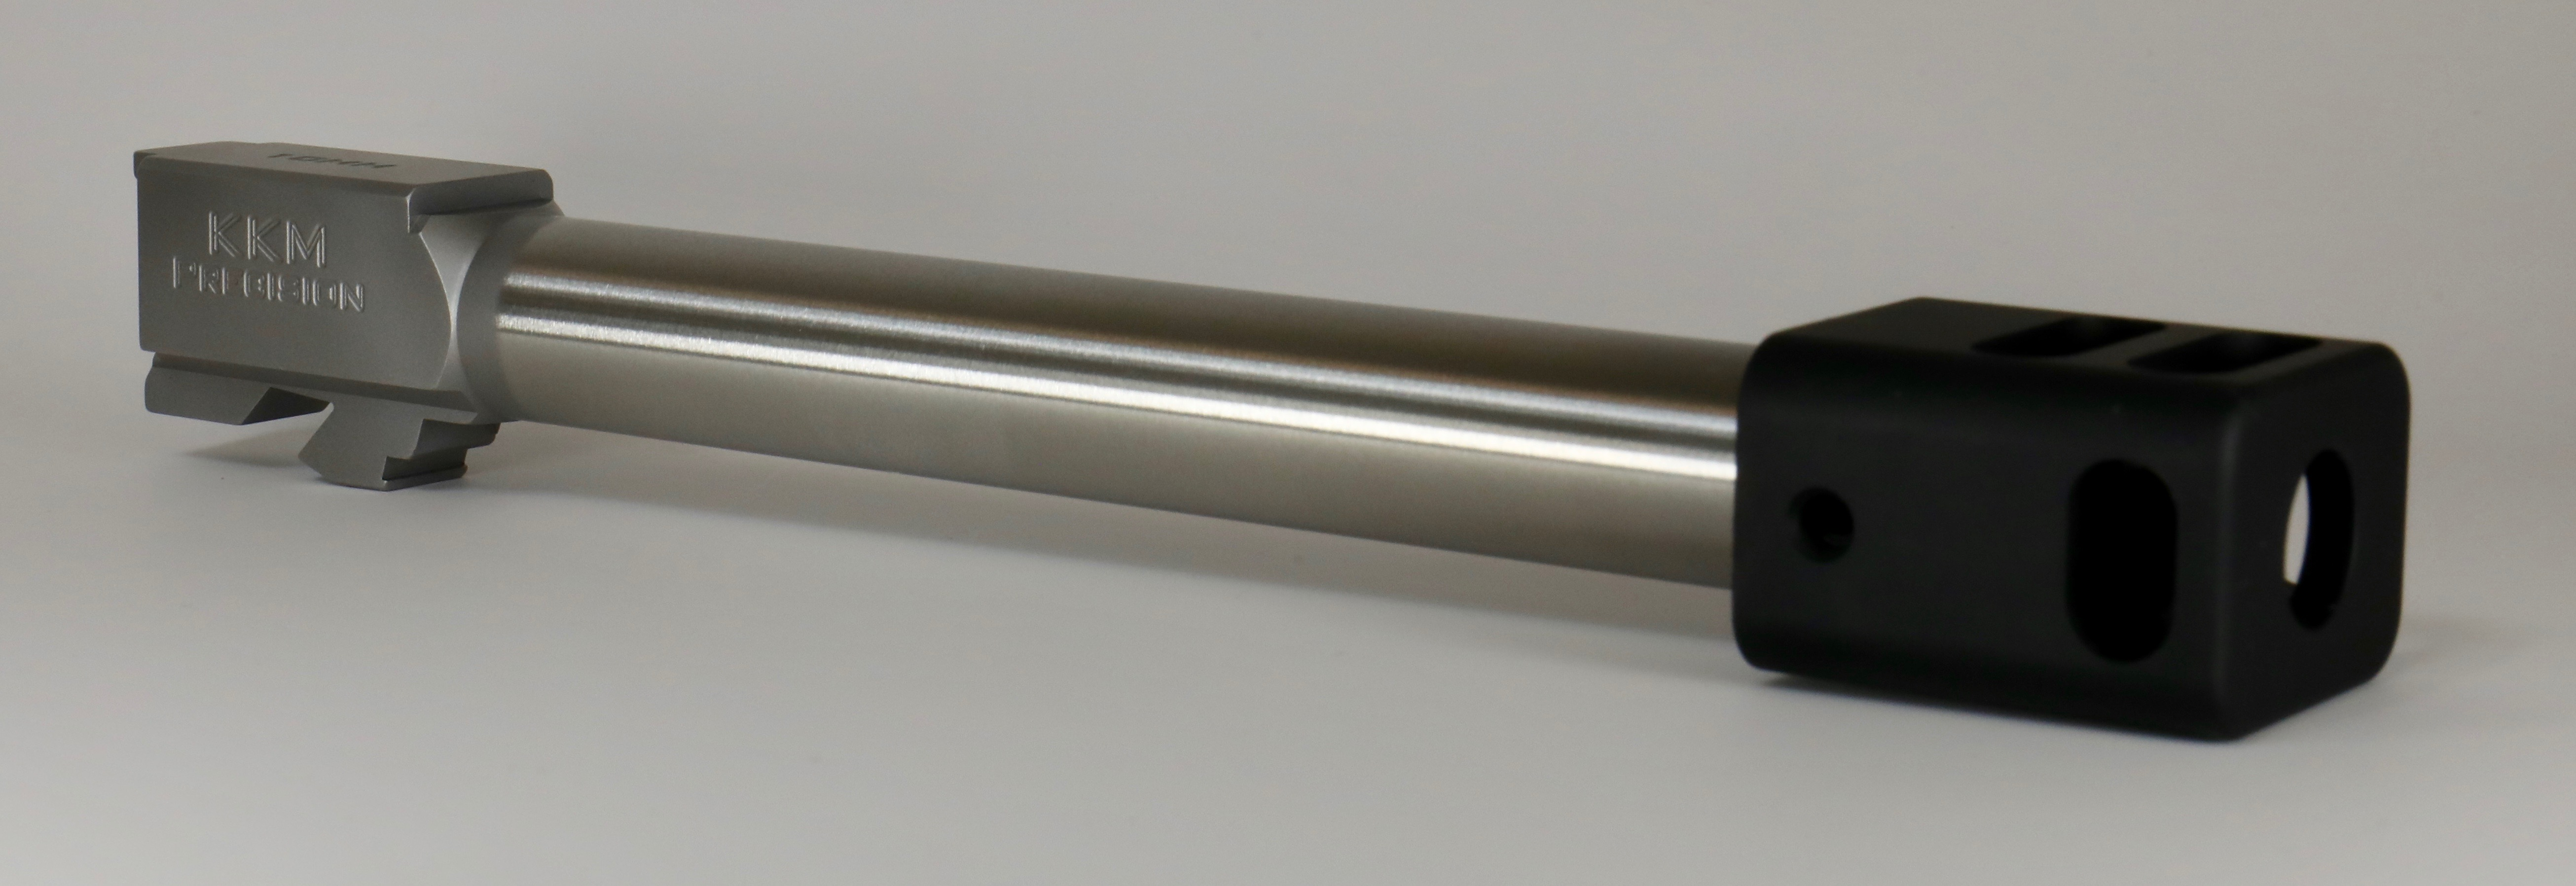 40 Match 10MM Barrel with 4-Port Compensator